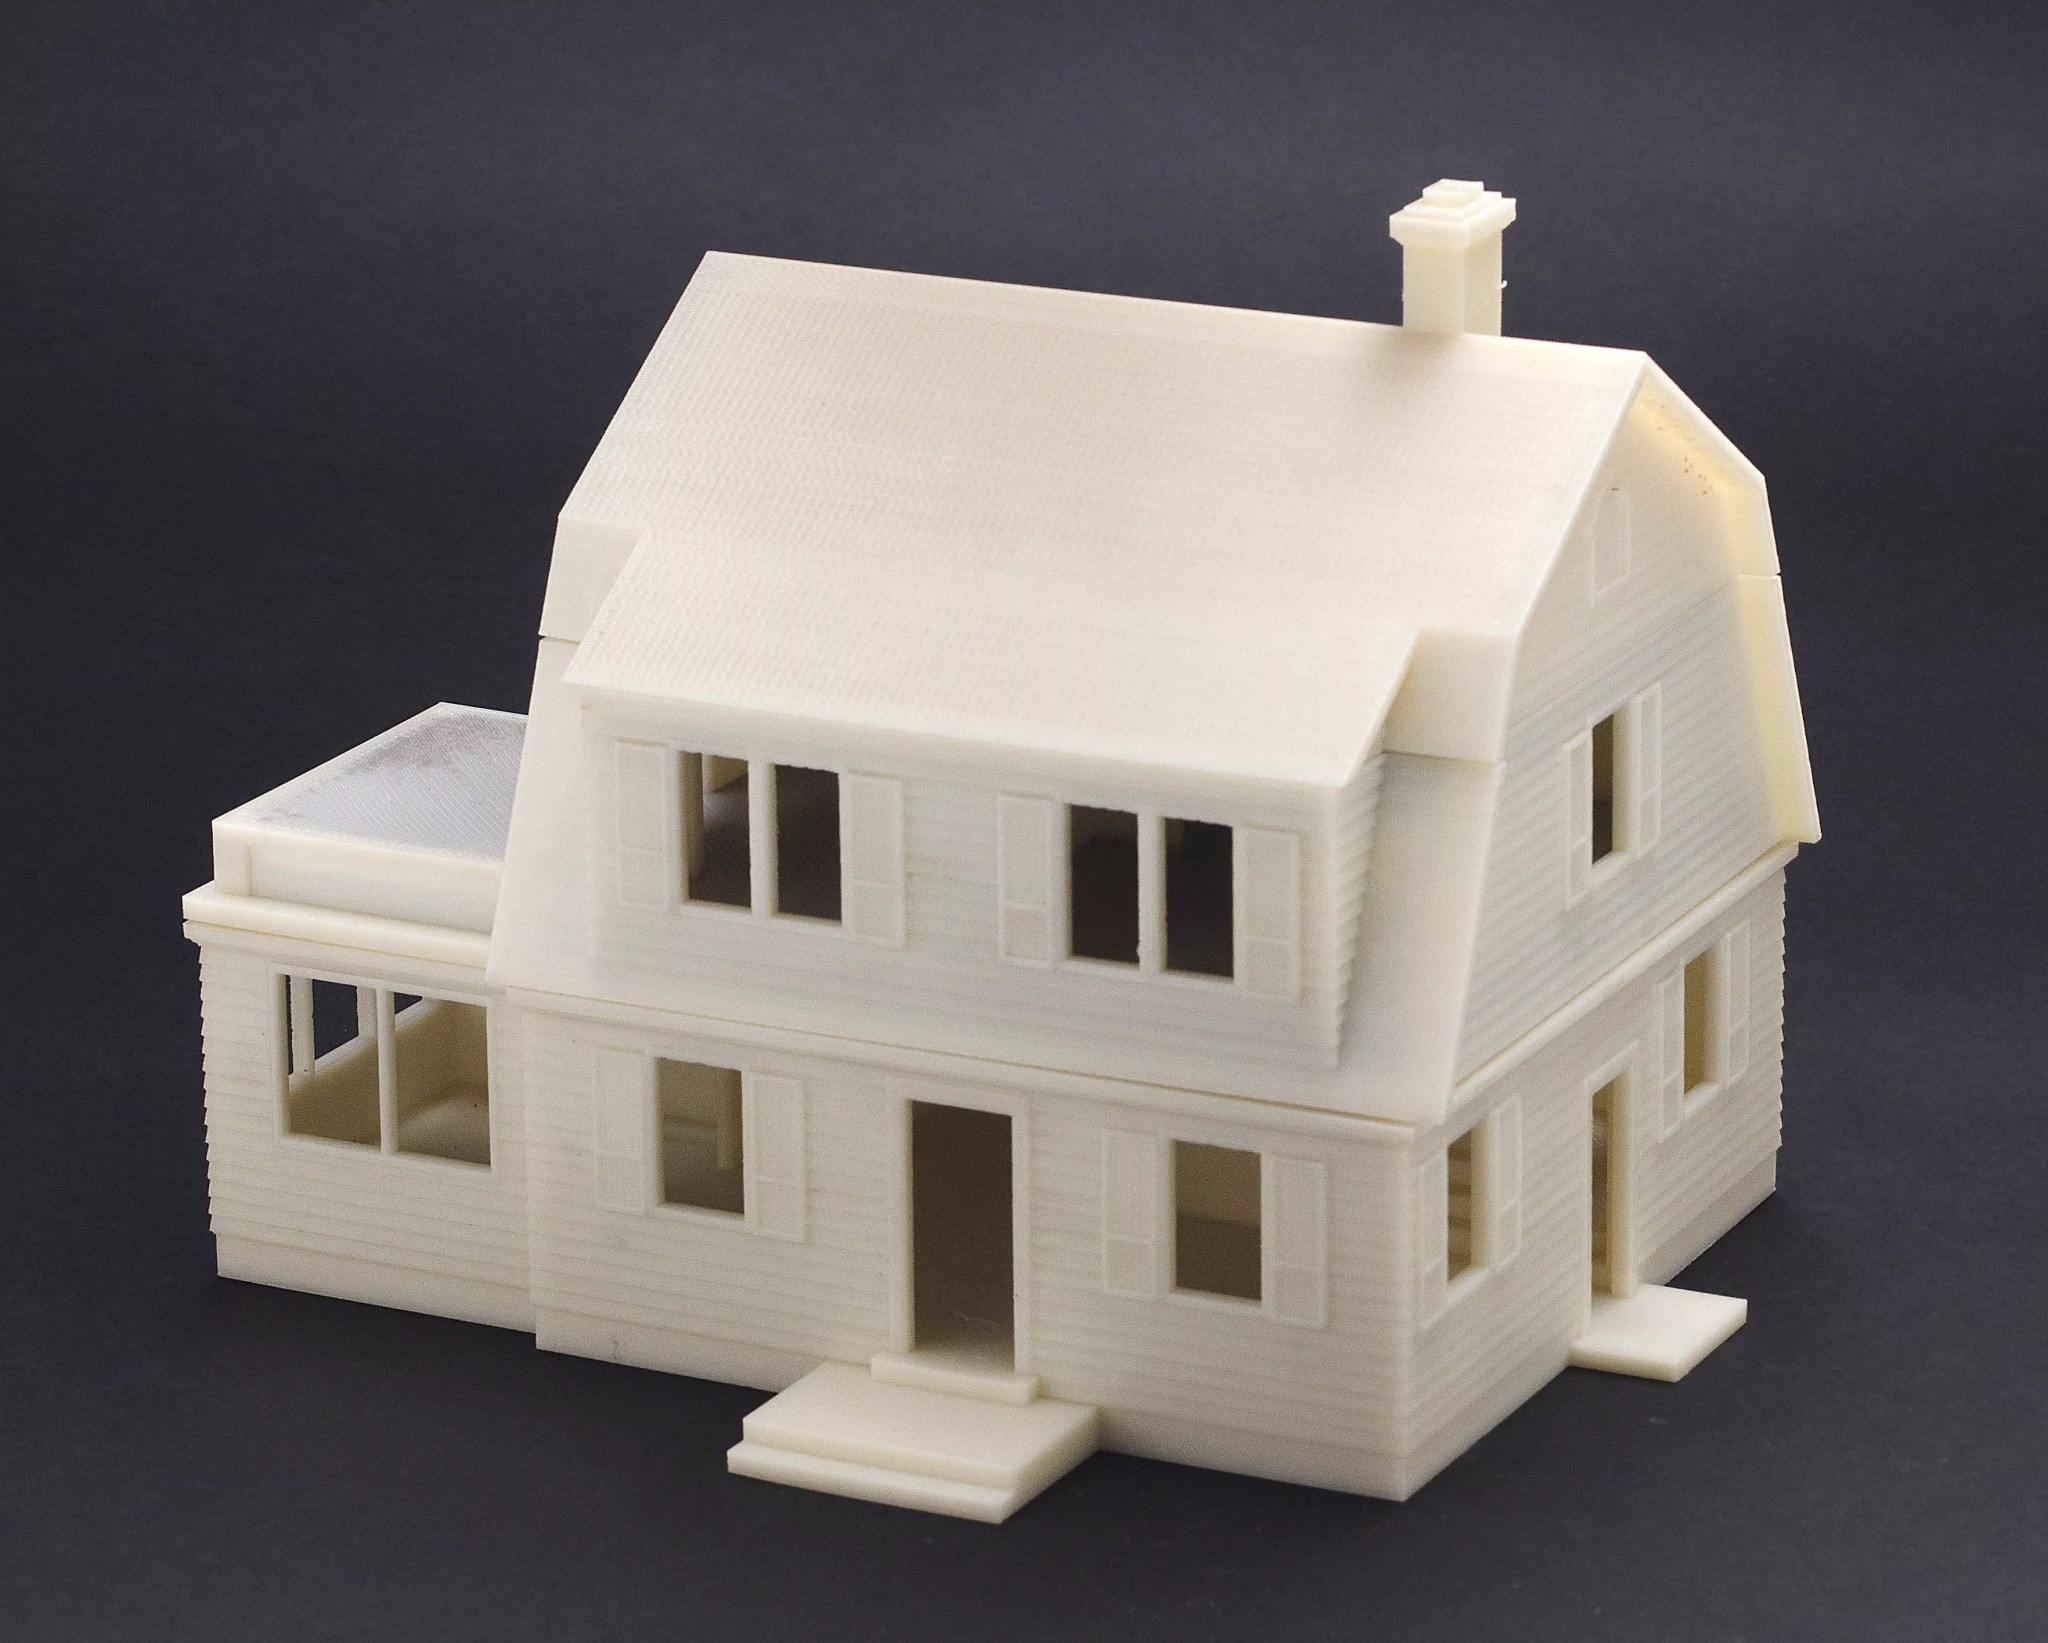 architectural cad design lancaster county career u0026 technology center